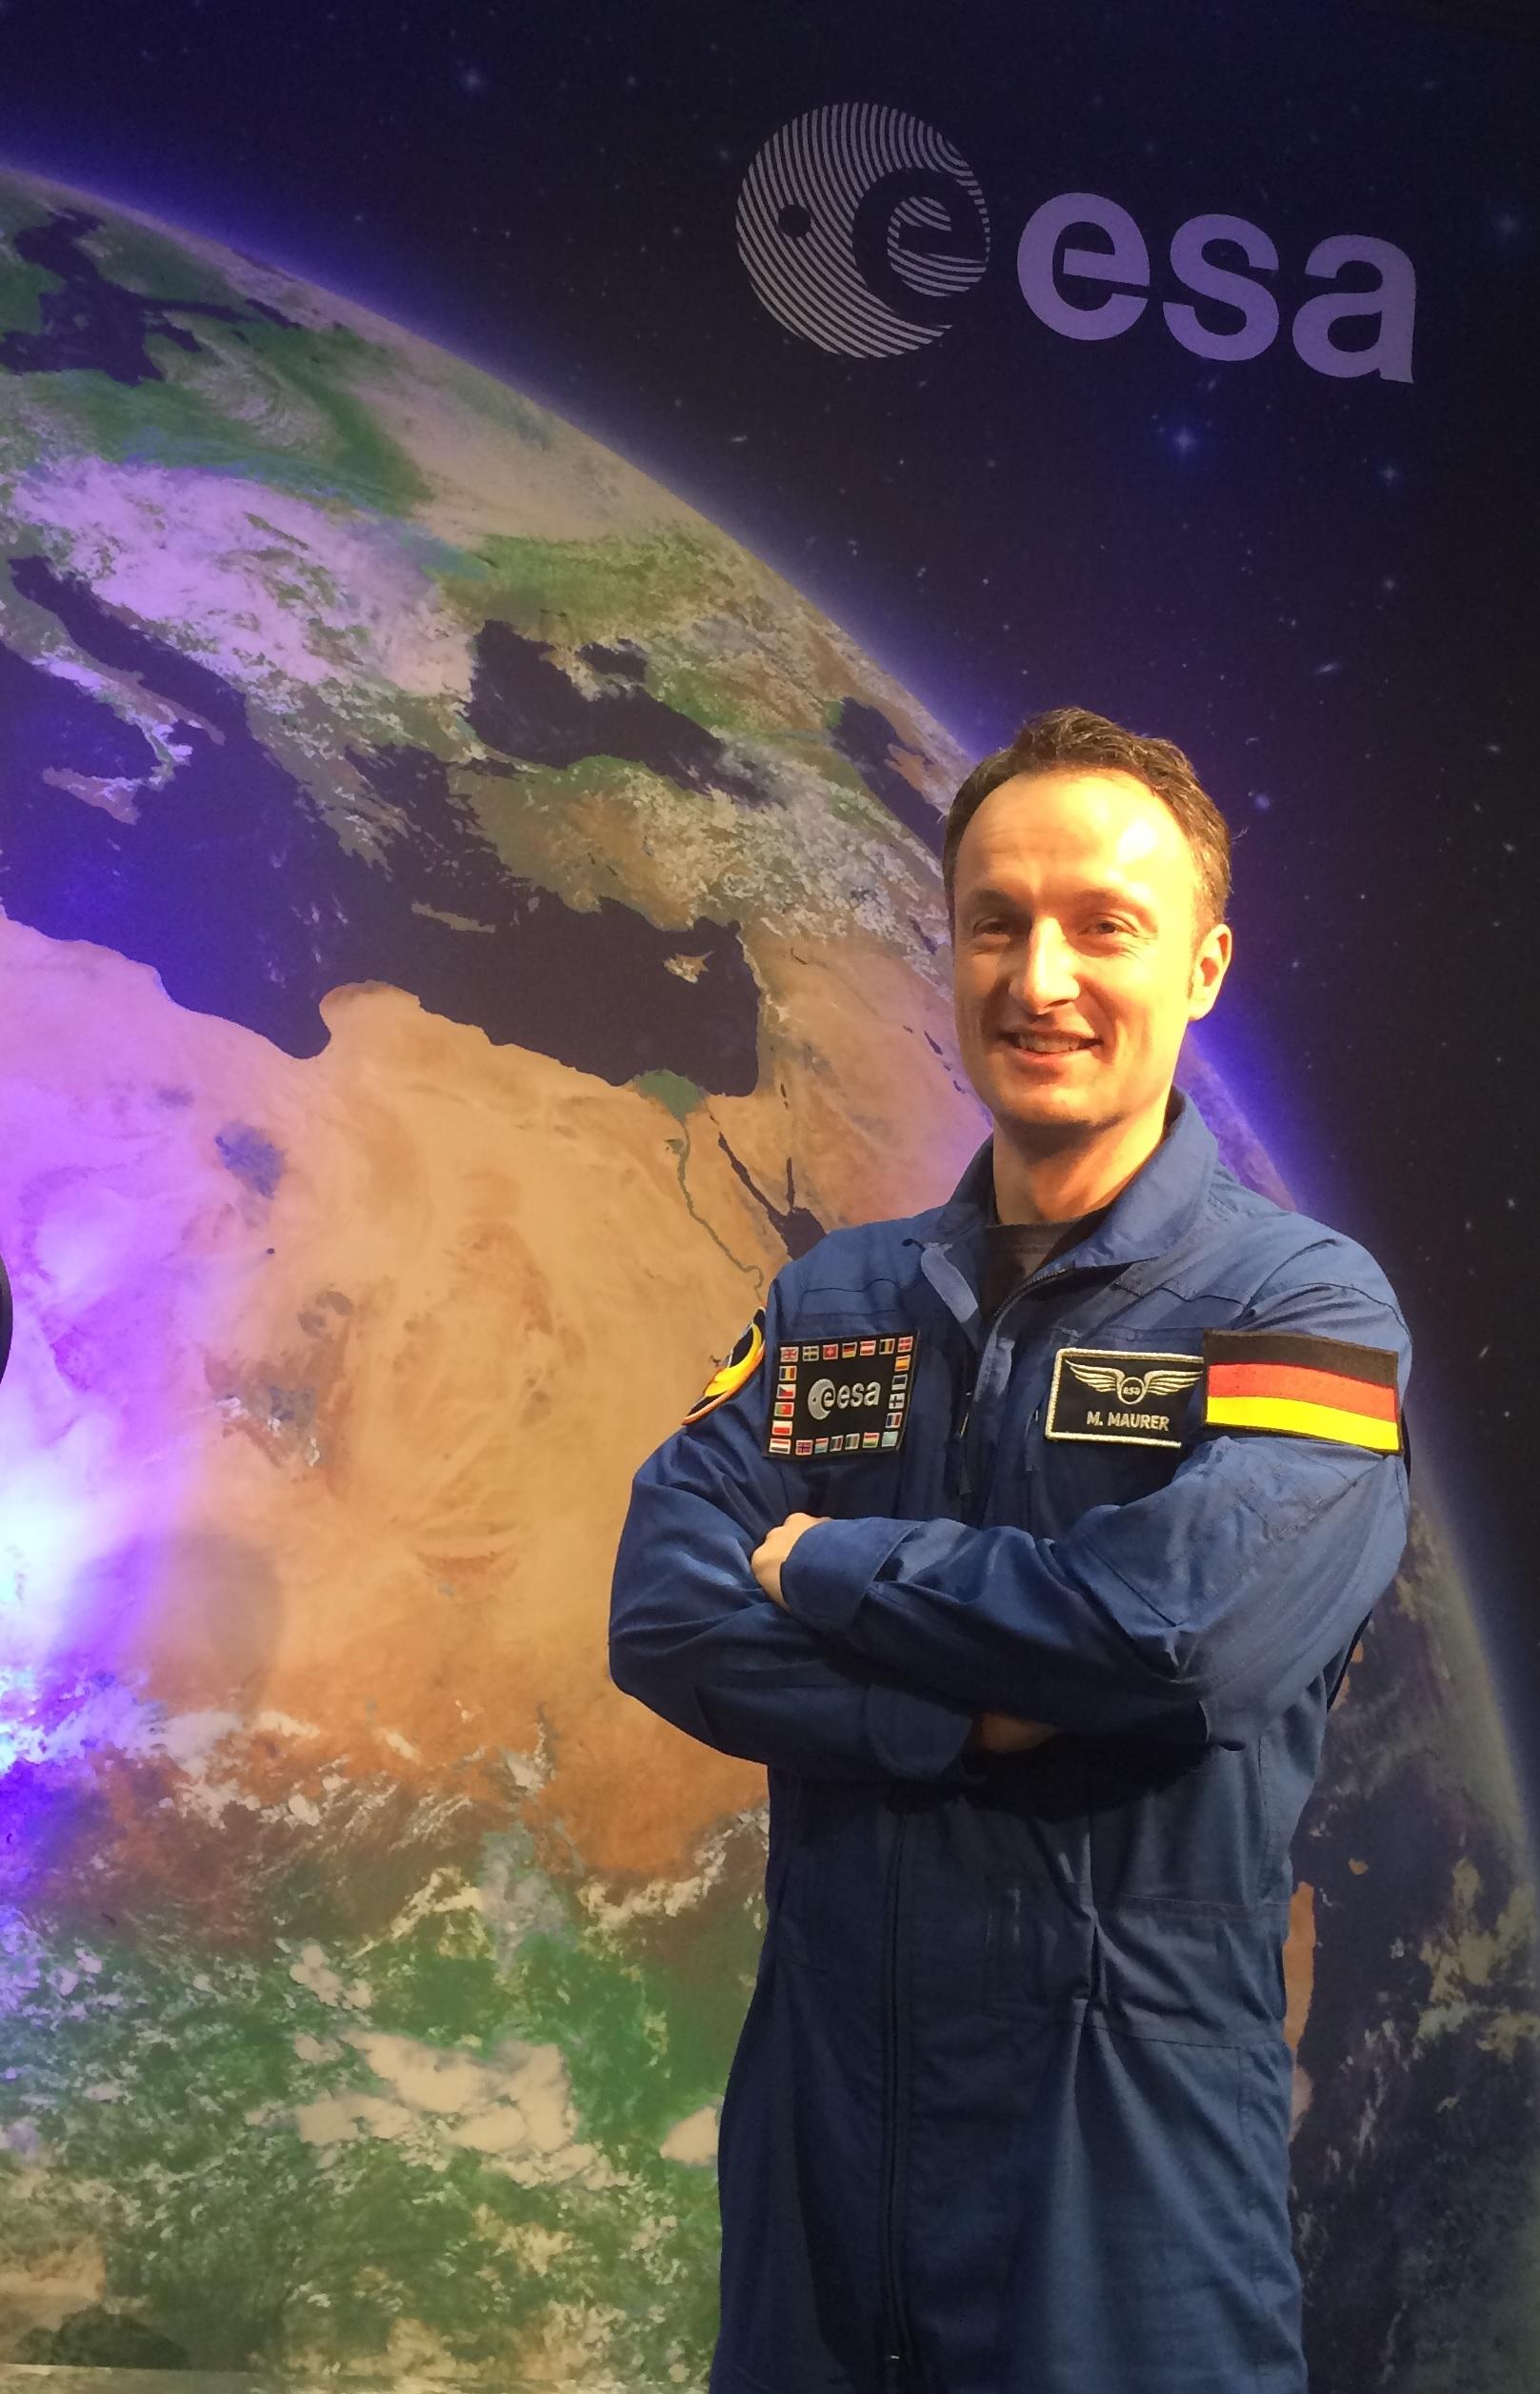 El Durisimo Entrenamiento Para Llegar A Ser Astronauta, Planeta Incógnito